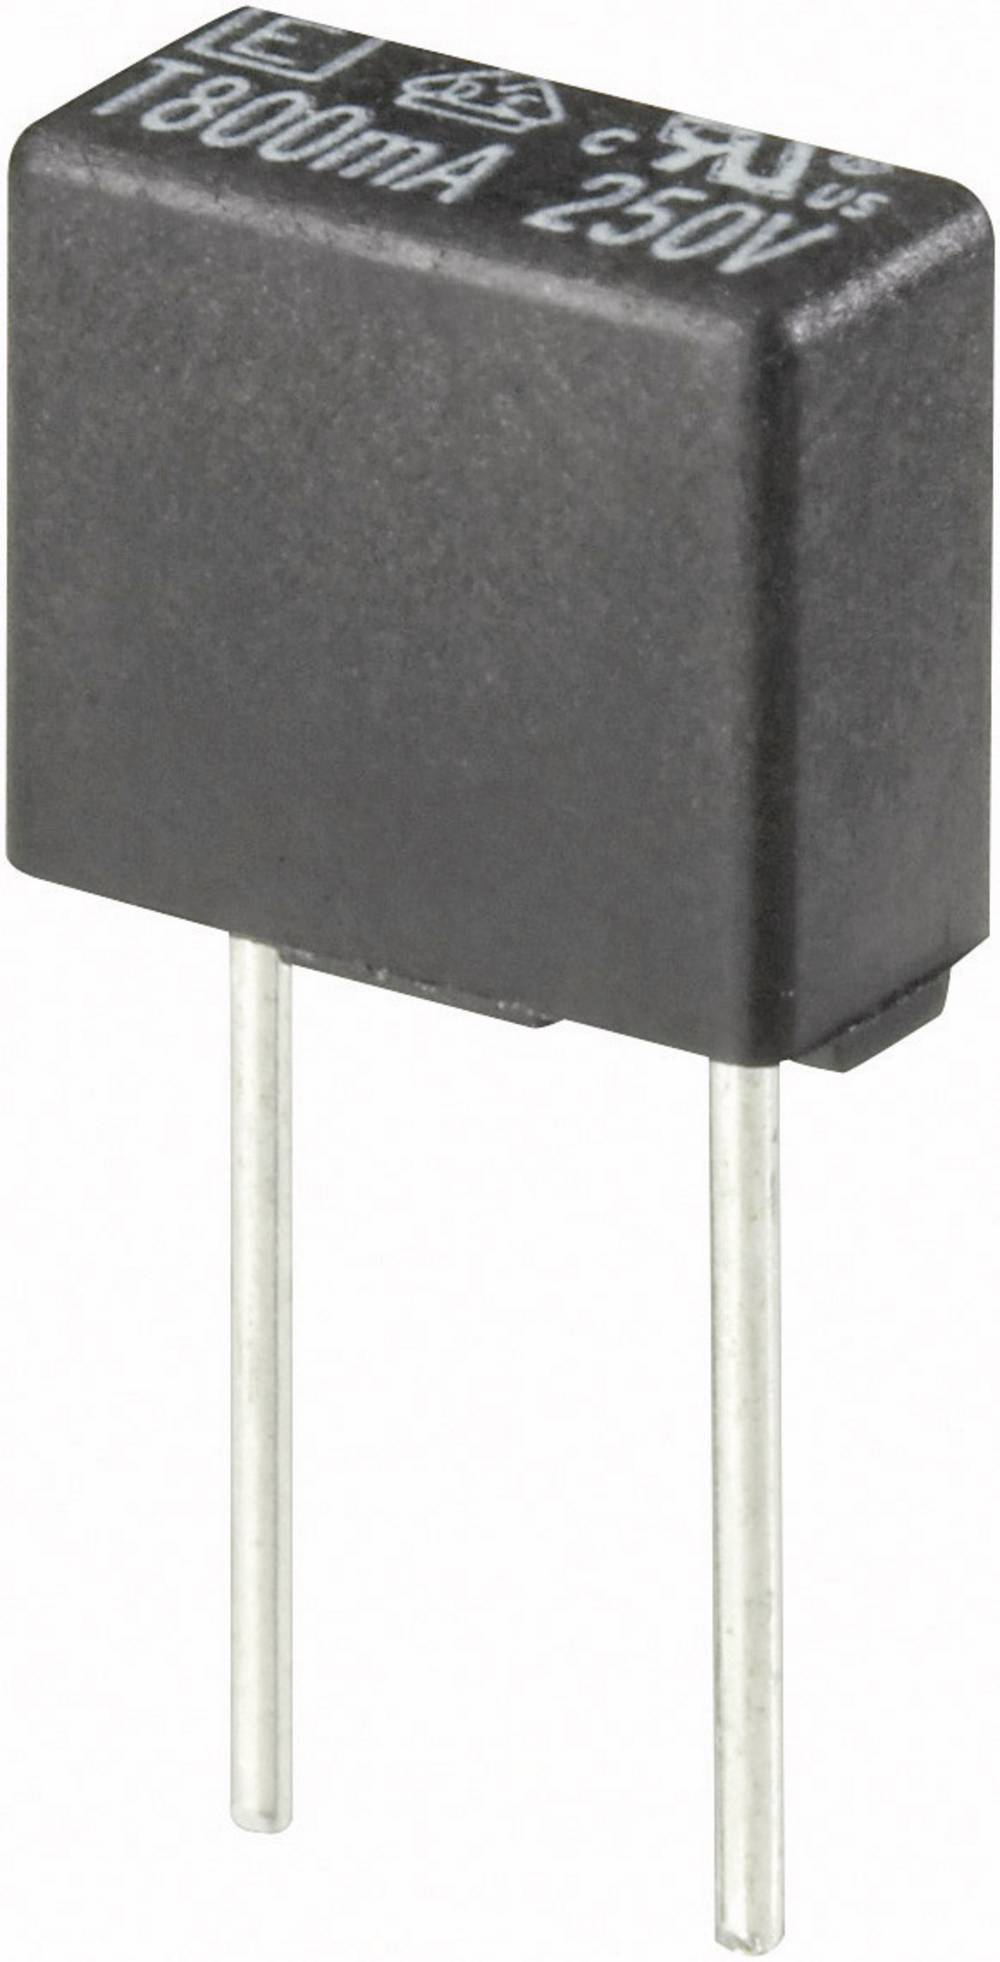 Mikrosikring ESKA 883011 250 mA 250 V kantet Træg -T- med radial tråd 500 stk